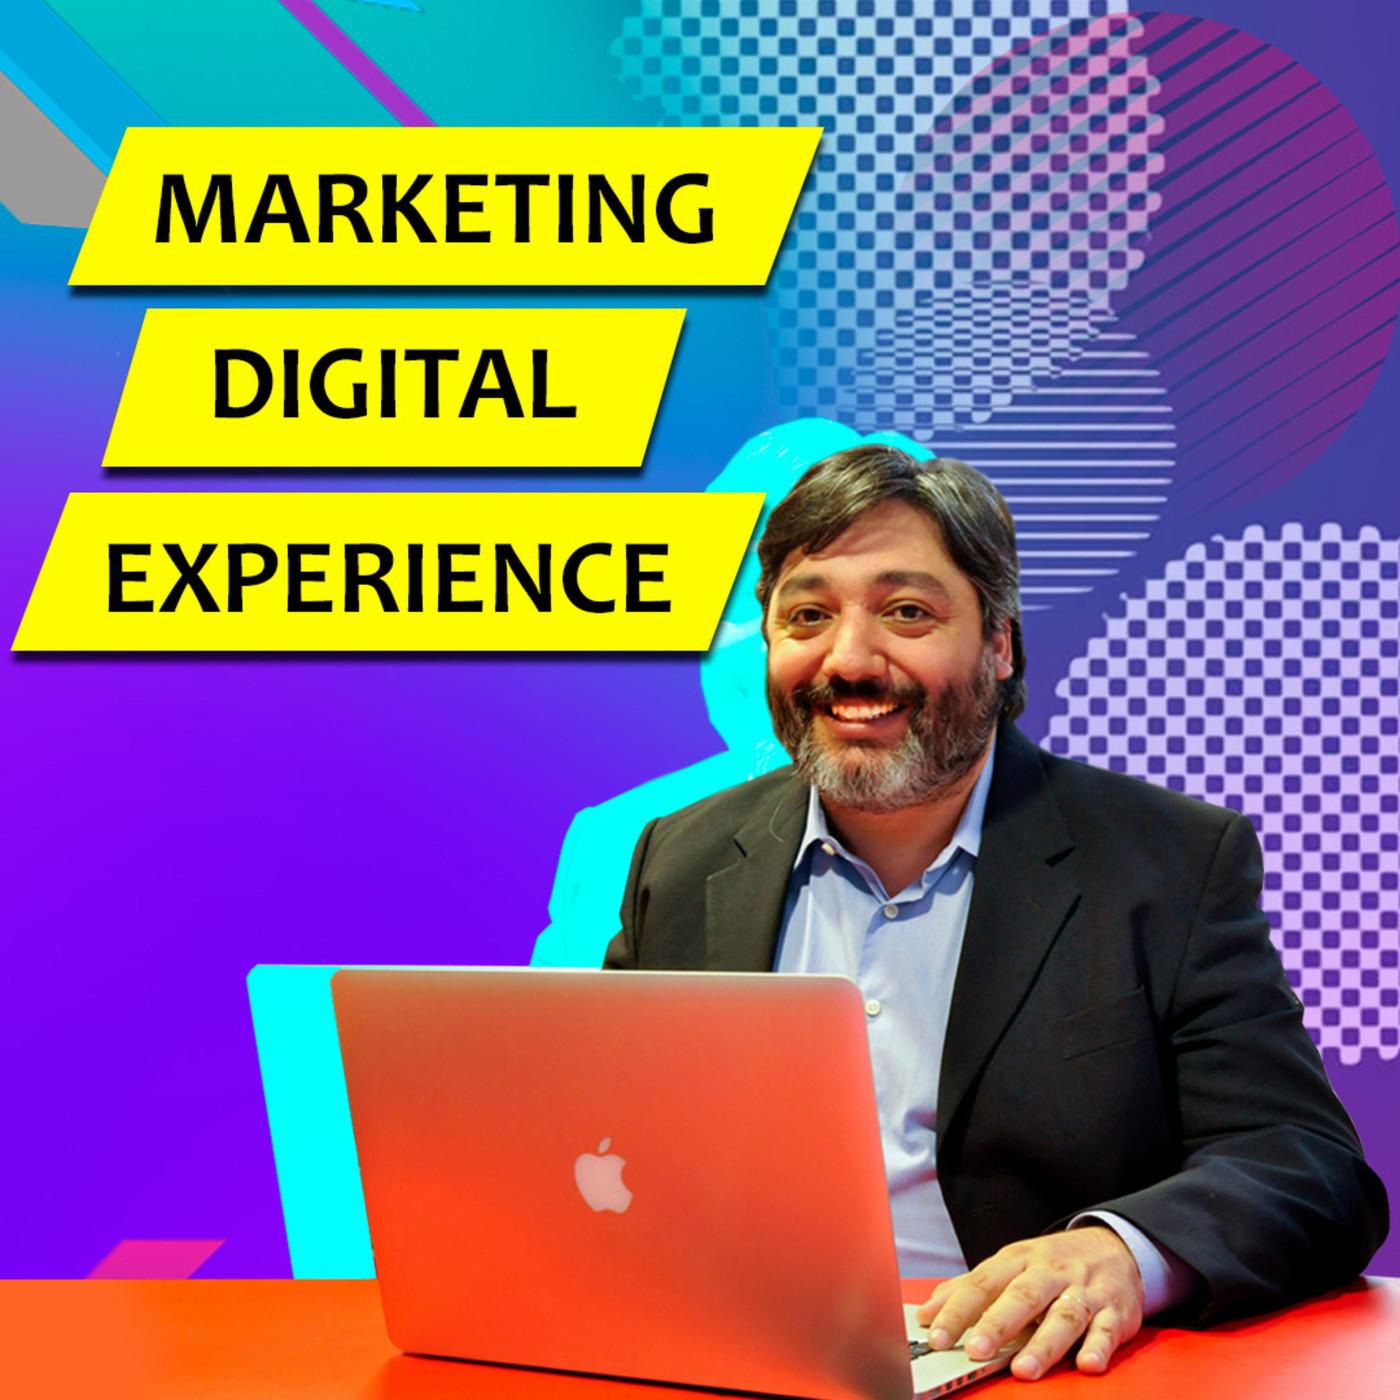 #043 [VIVO] Haciendo Marketing Digital